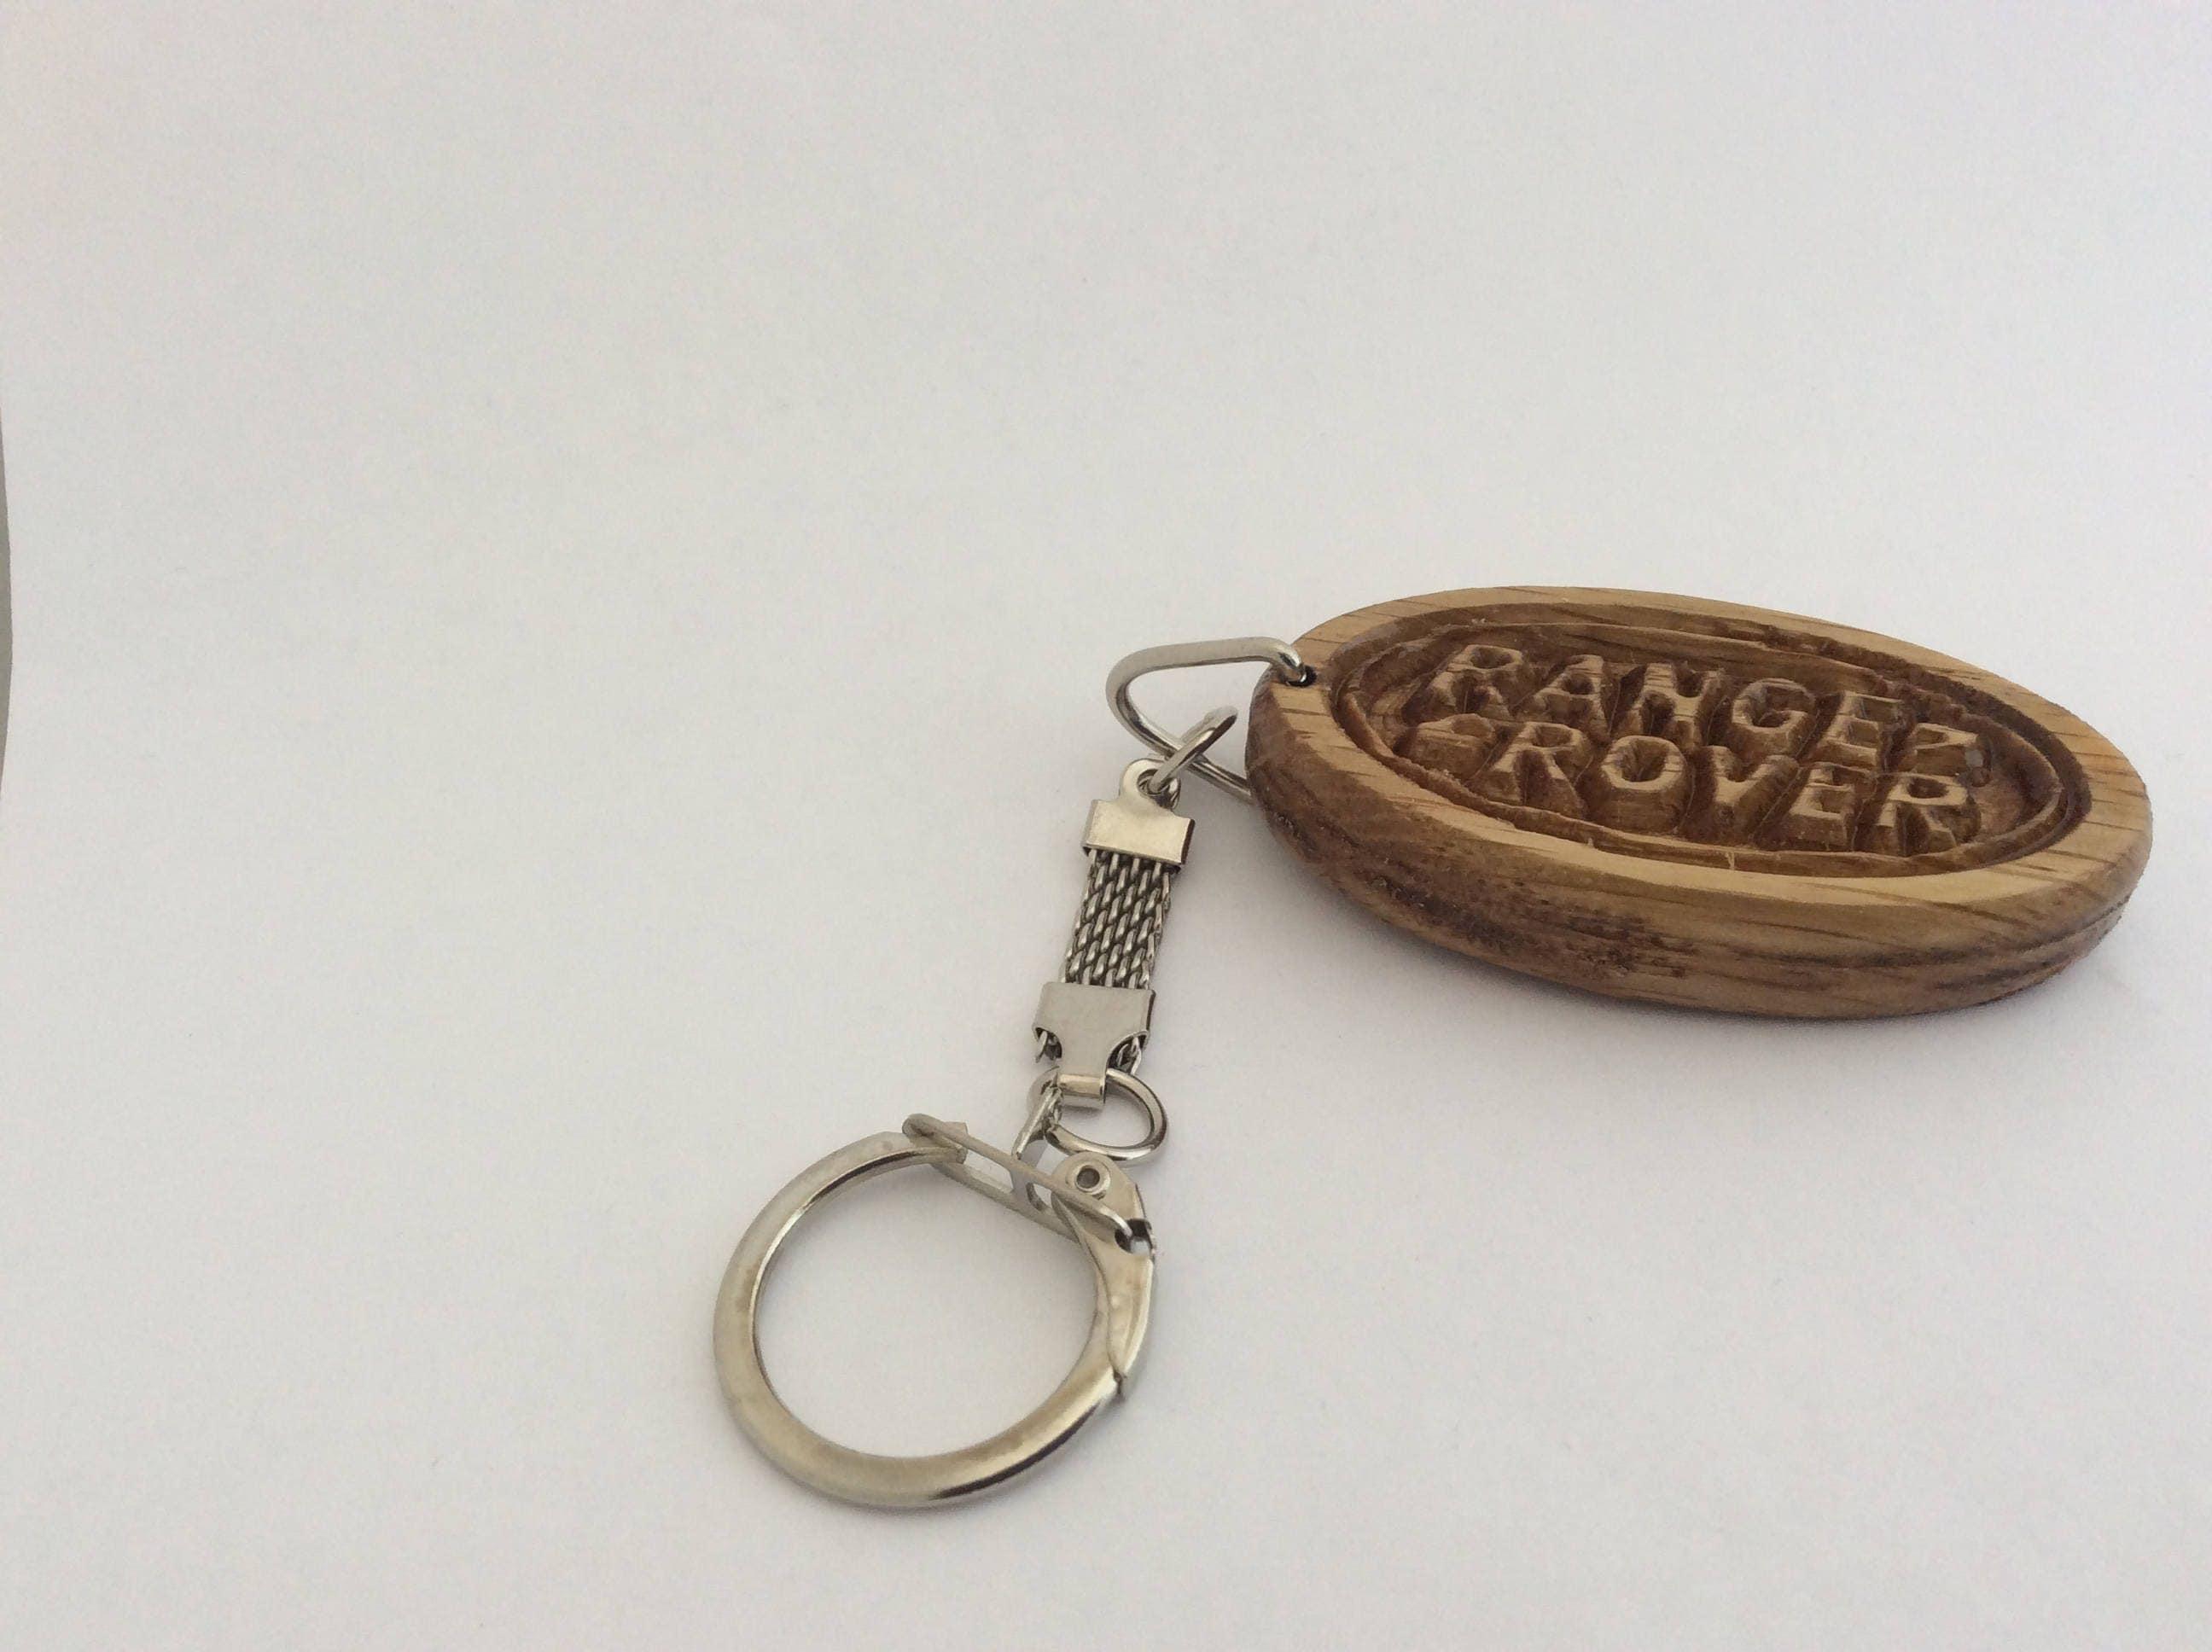 RANGE ROVER Car Logo Keyring Wooden Keychain